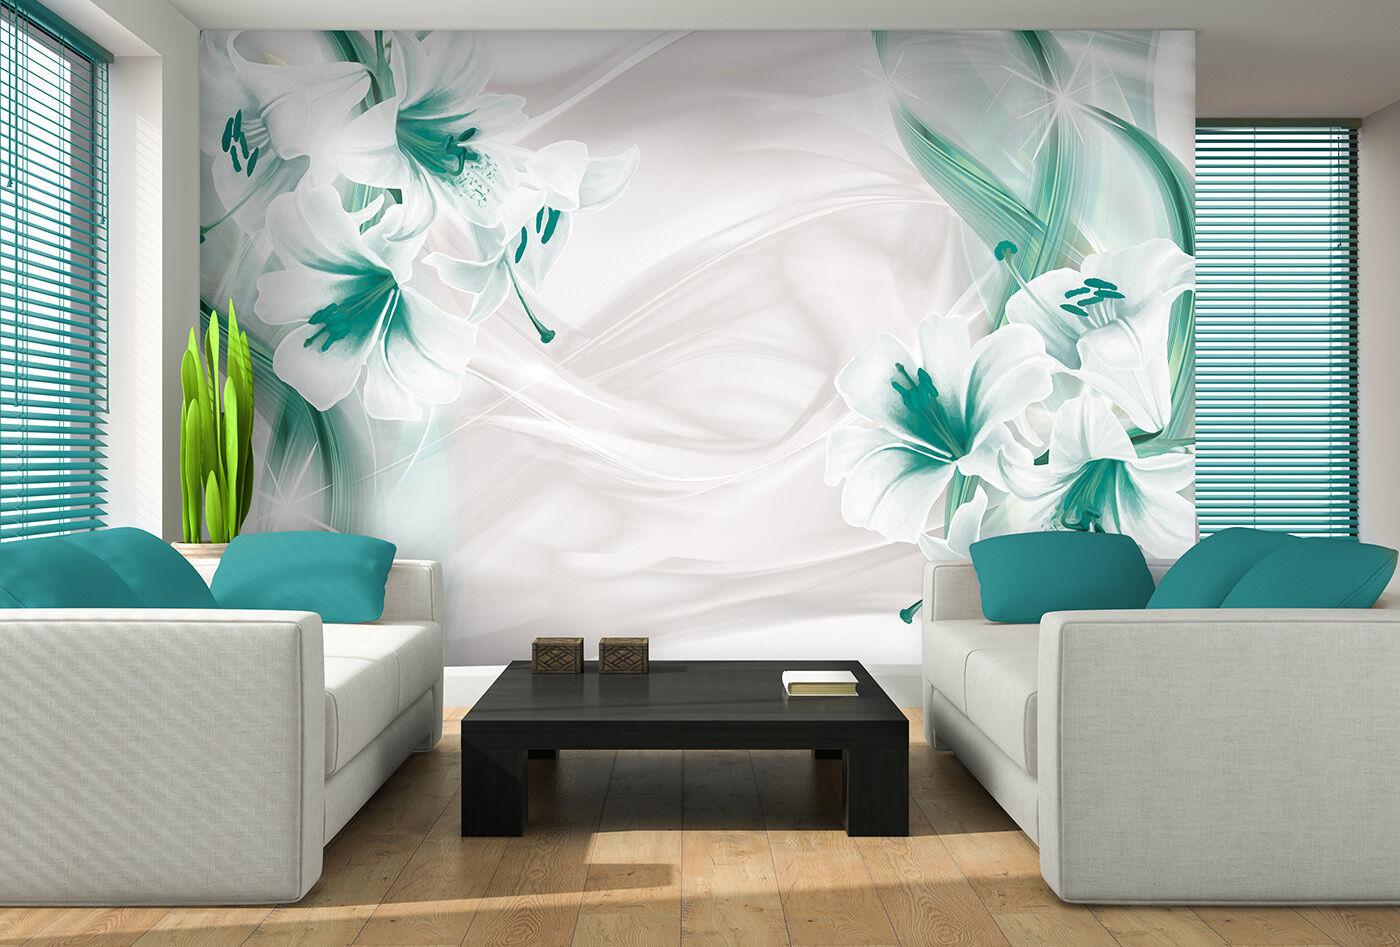 vlies poster wandbild tapeten fototapete gr n pflanzen. Black Bedroom Furniture Sets. Home Design Ideas